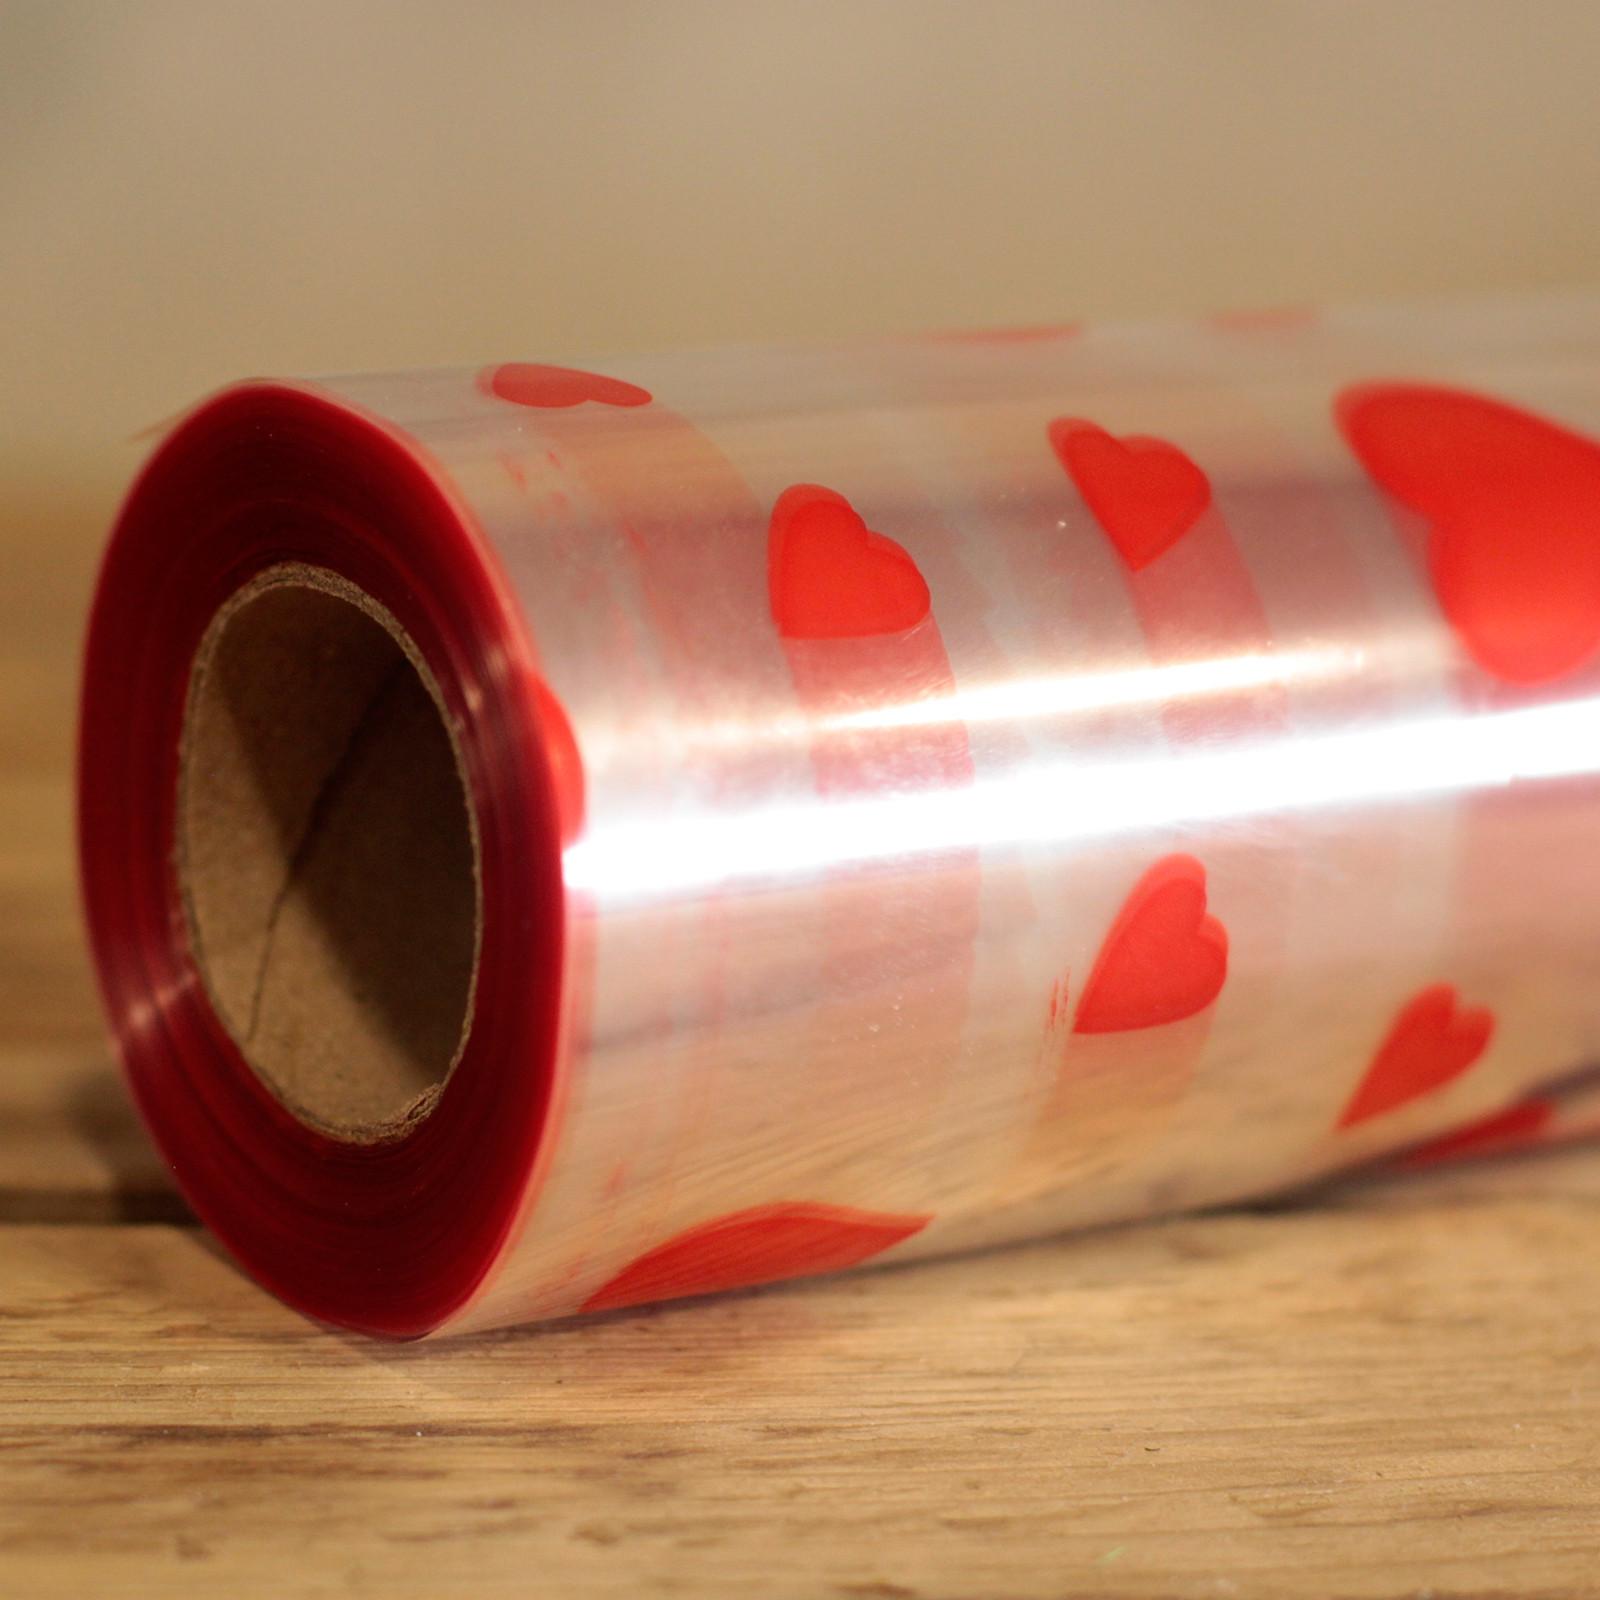 Red Hearts Design Film Wrap 100m x 80cm